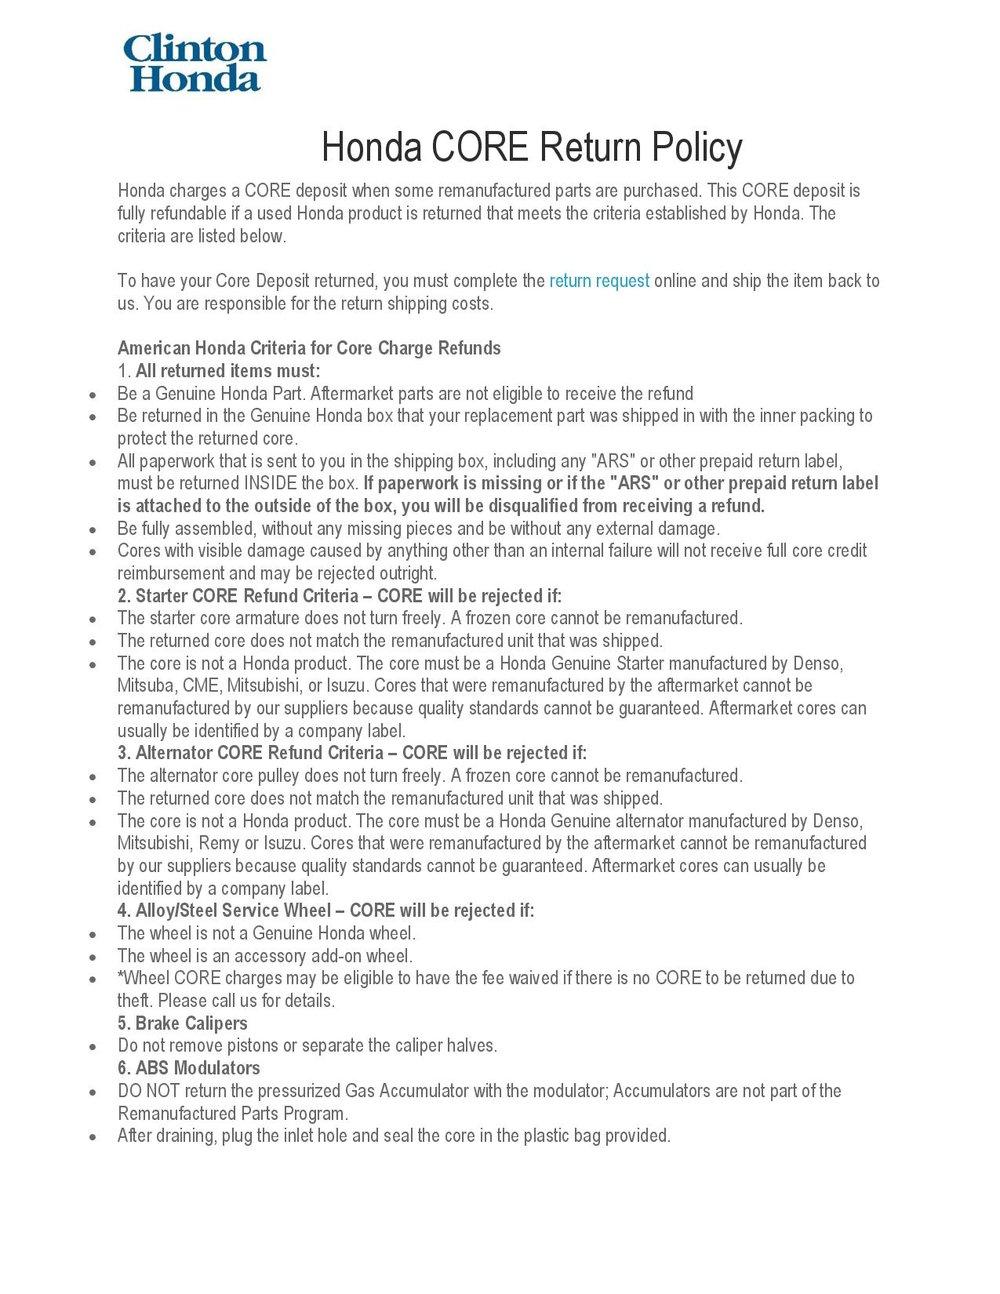 Honda CORE Return Policy-page-001.jpg